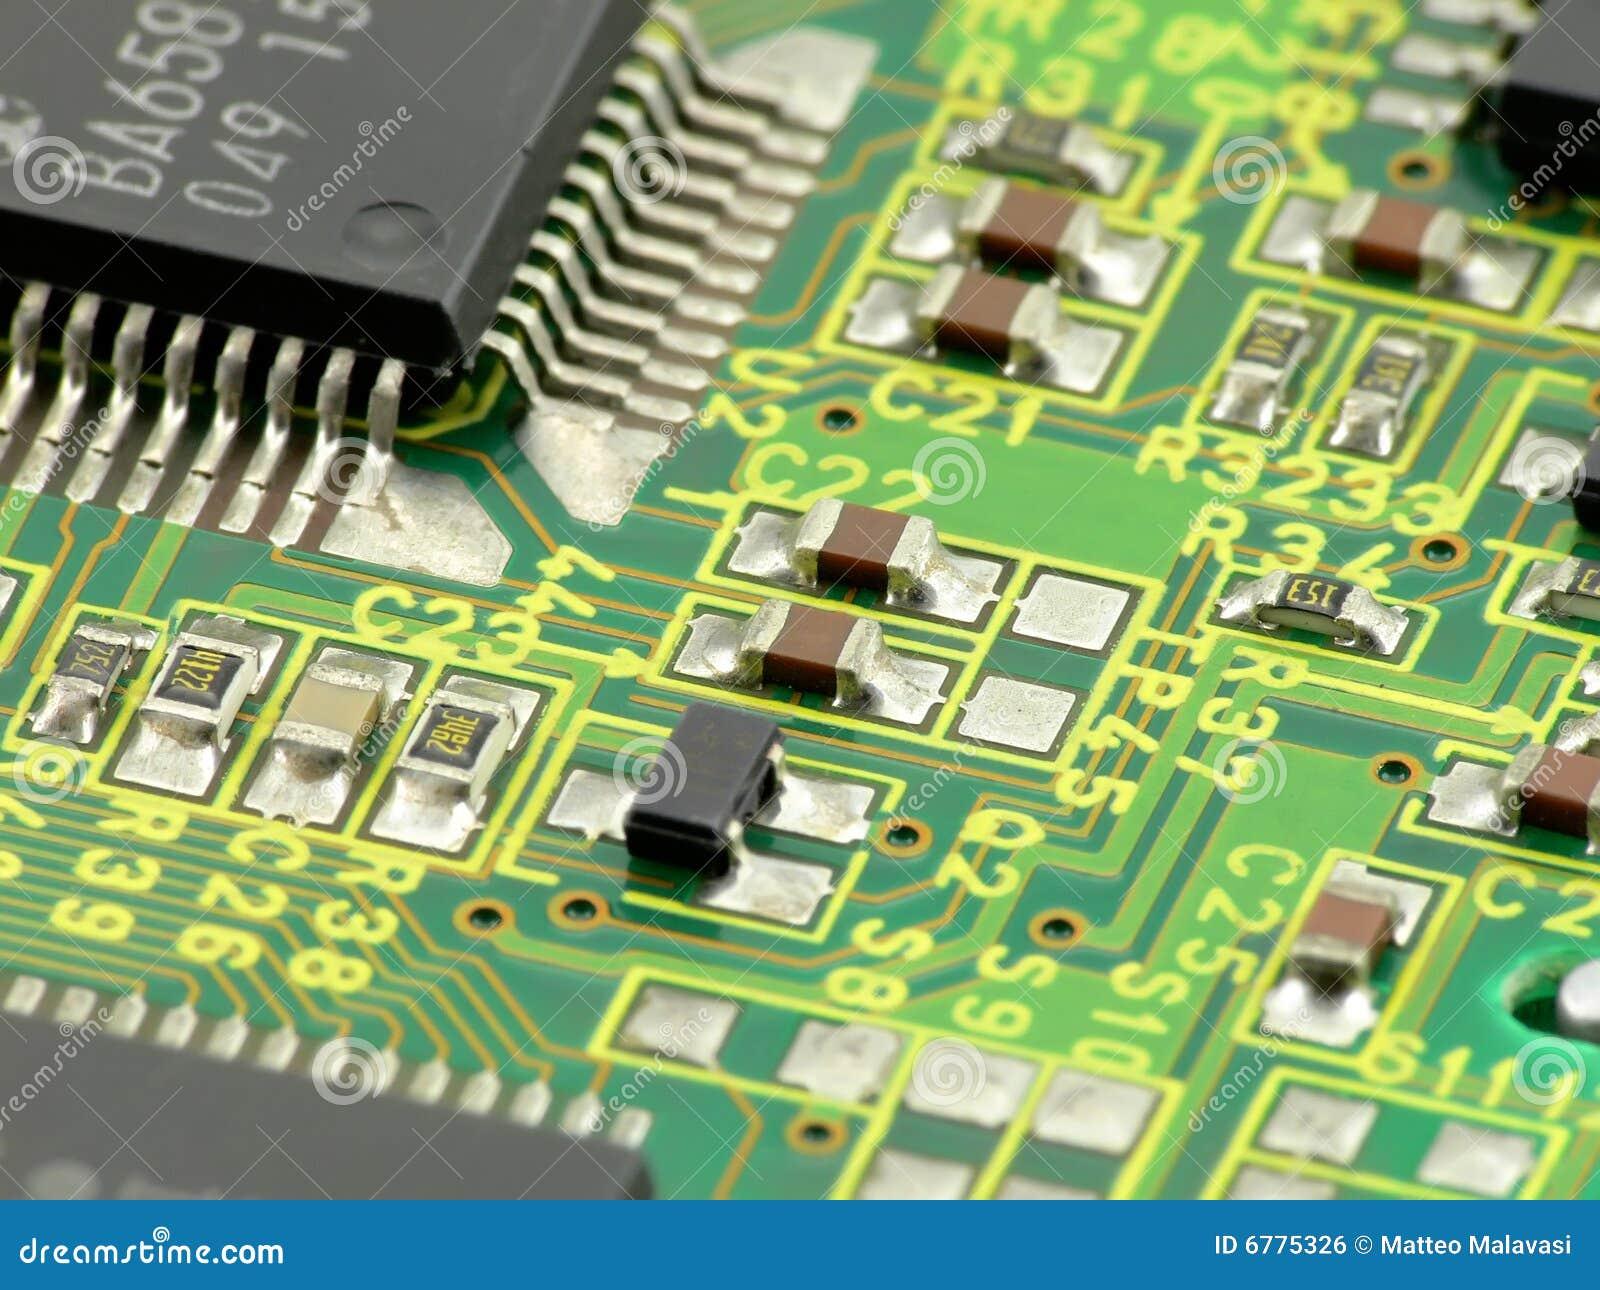 macro chip board stock photo  image of technology